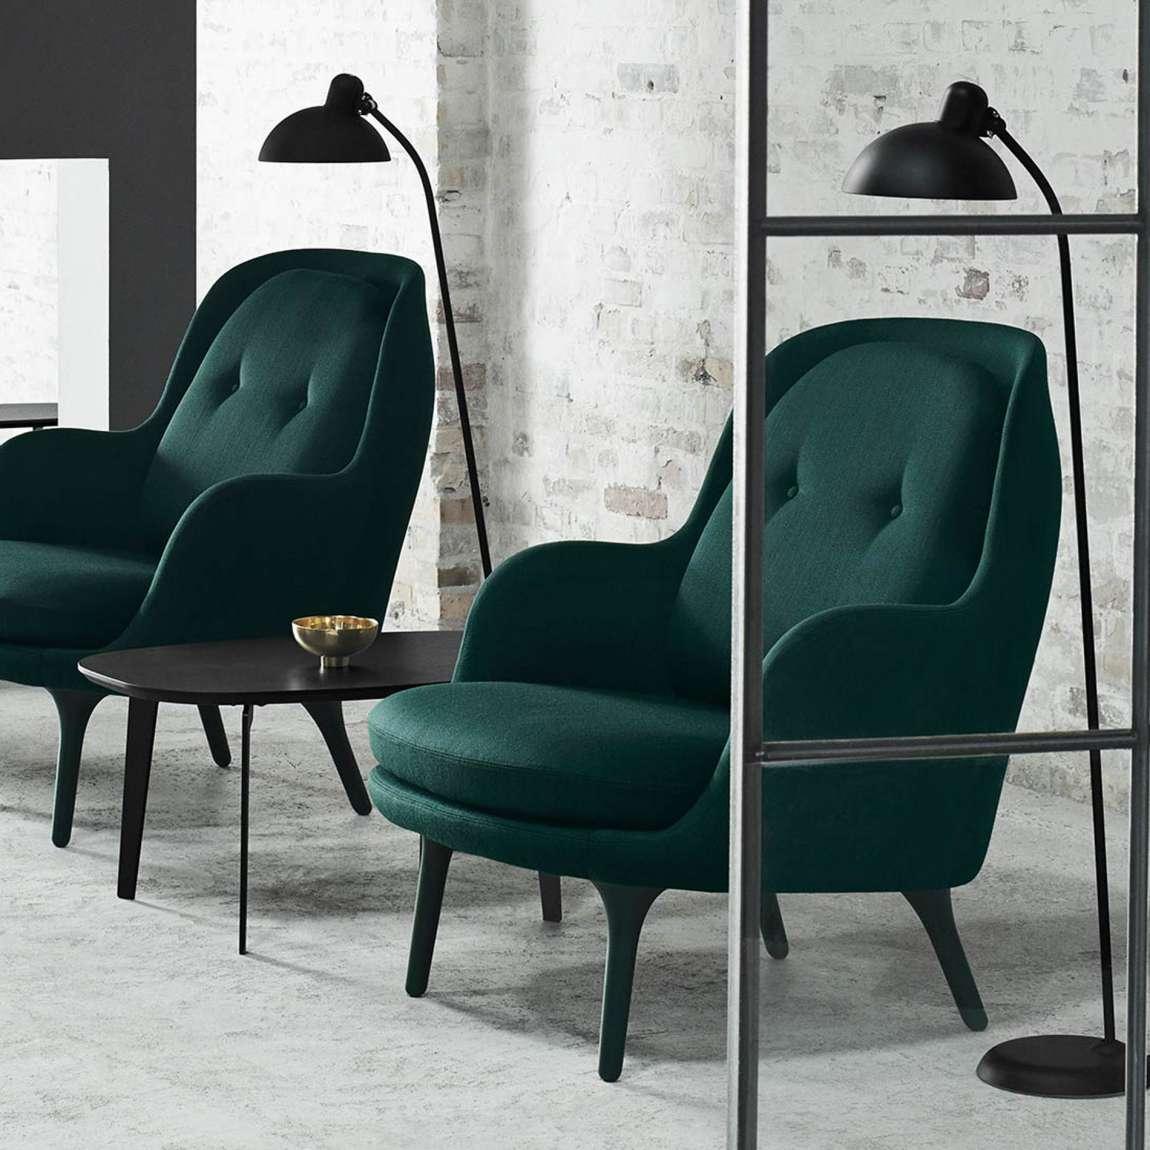 fritz hansen fri armchair trooves. Black Bedroom Furniture Sets. Home Design Ideas